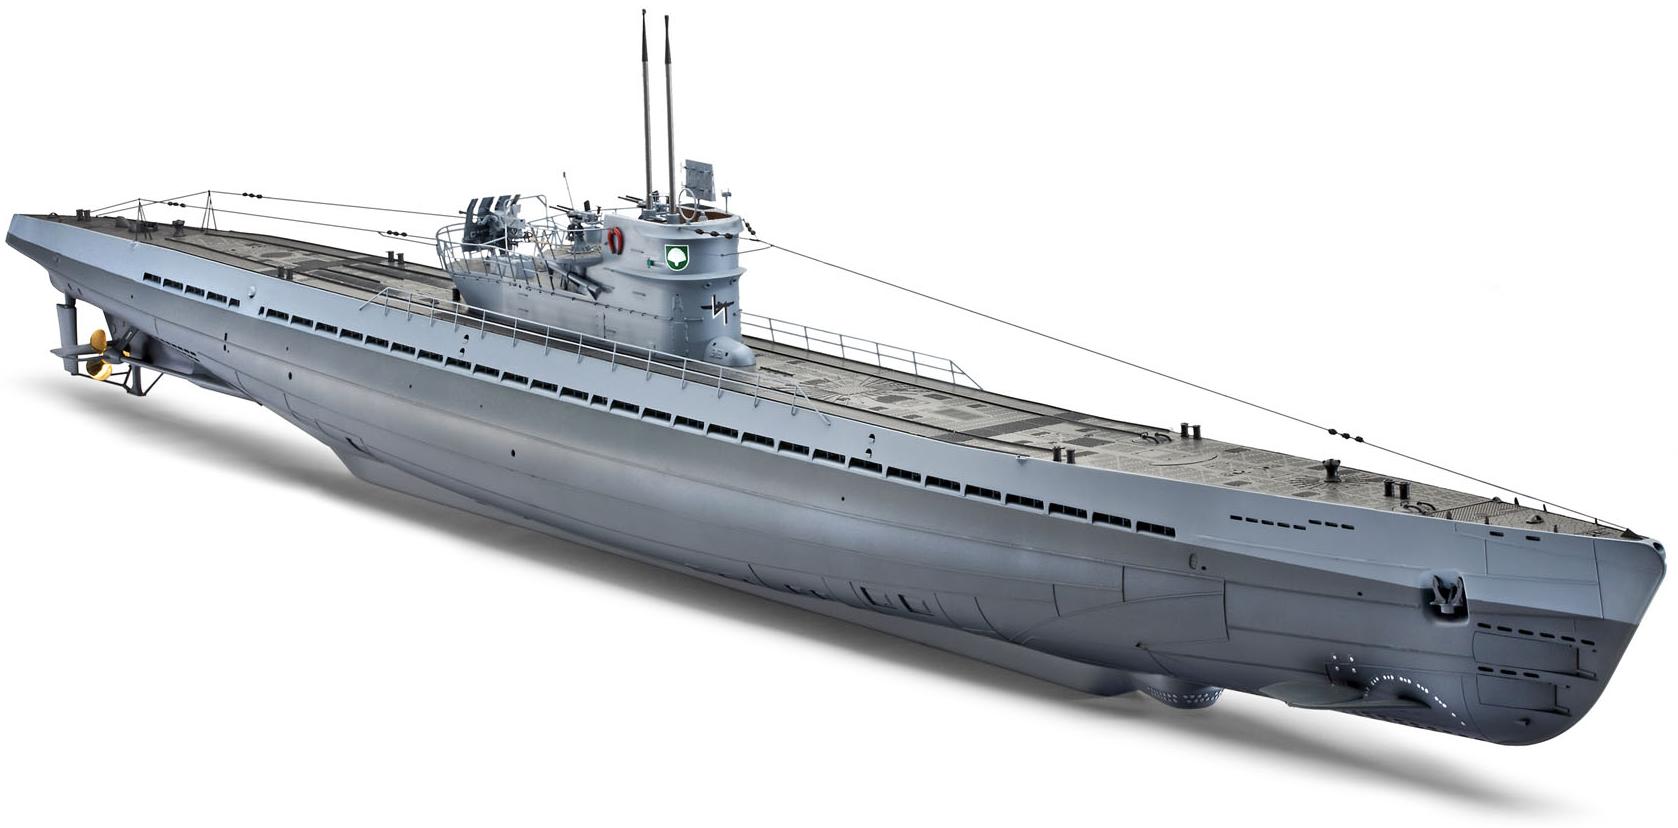 Revell German Submarine IX C 1:72 Scale Plastic Model Kit 05114 | Hobbies